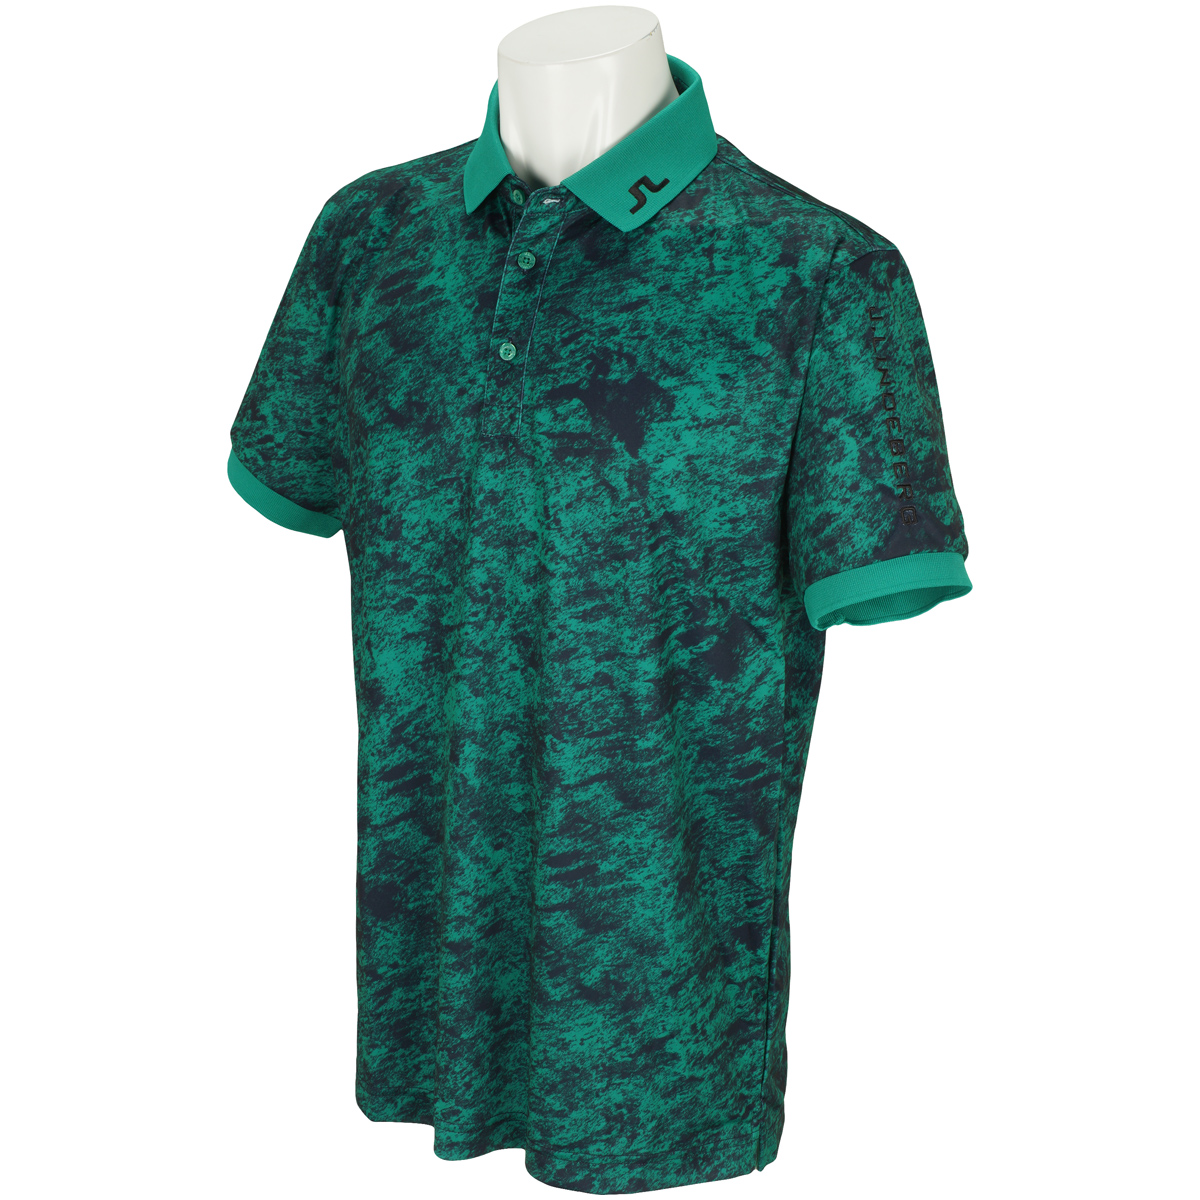 M9B M TOUR TECH SLIM CAMOU PRINT 半袖ポロシャツ